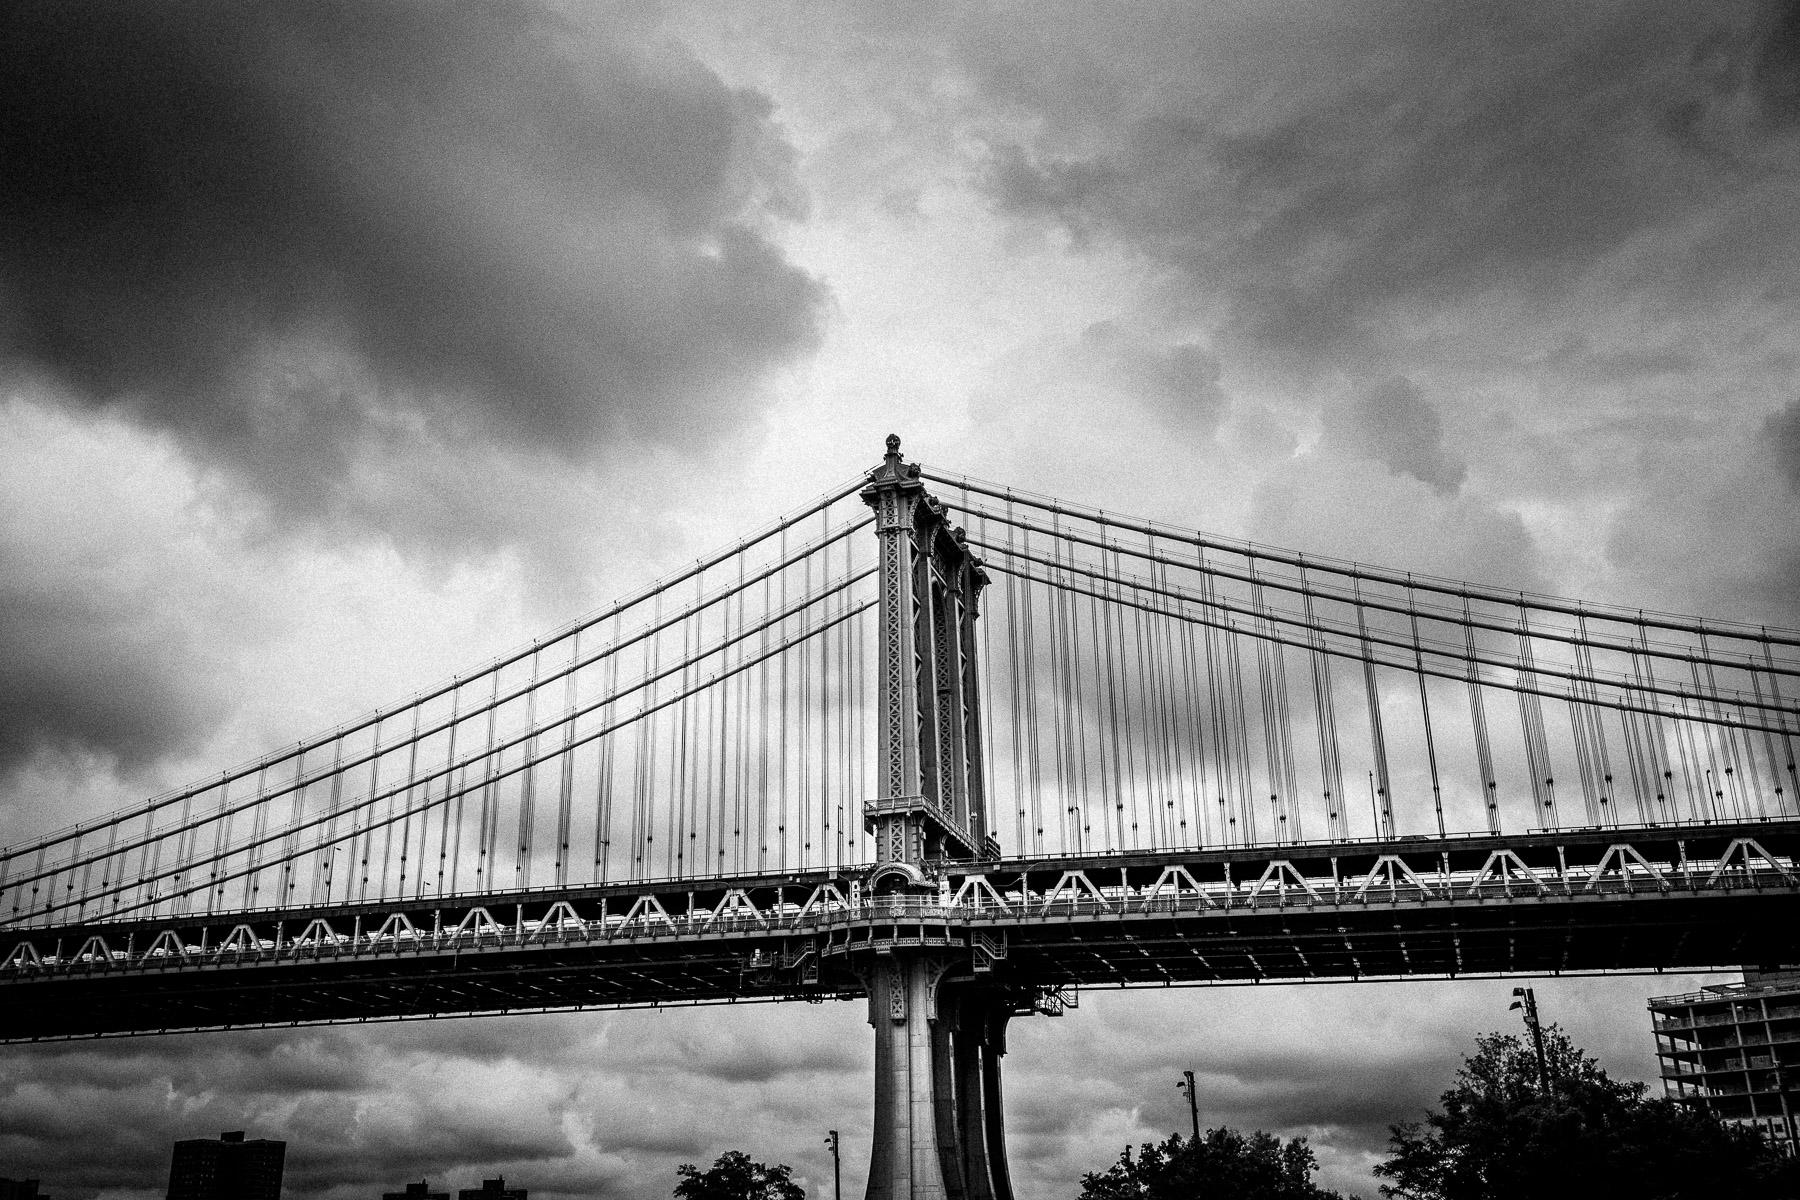 brookyn-bridge-photos-black-and-white.jpg